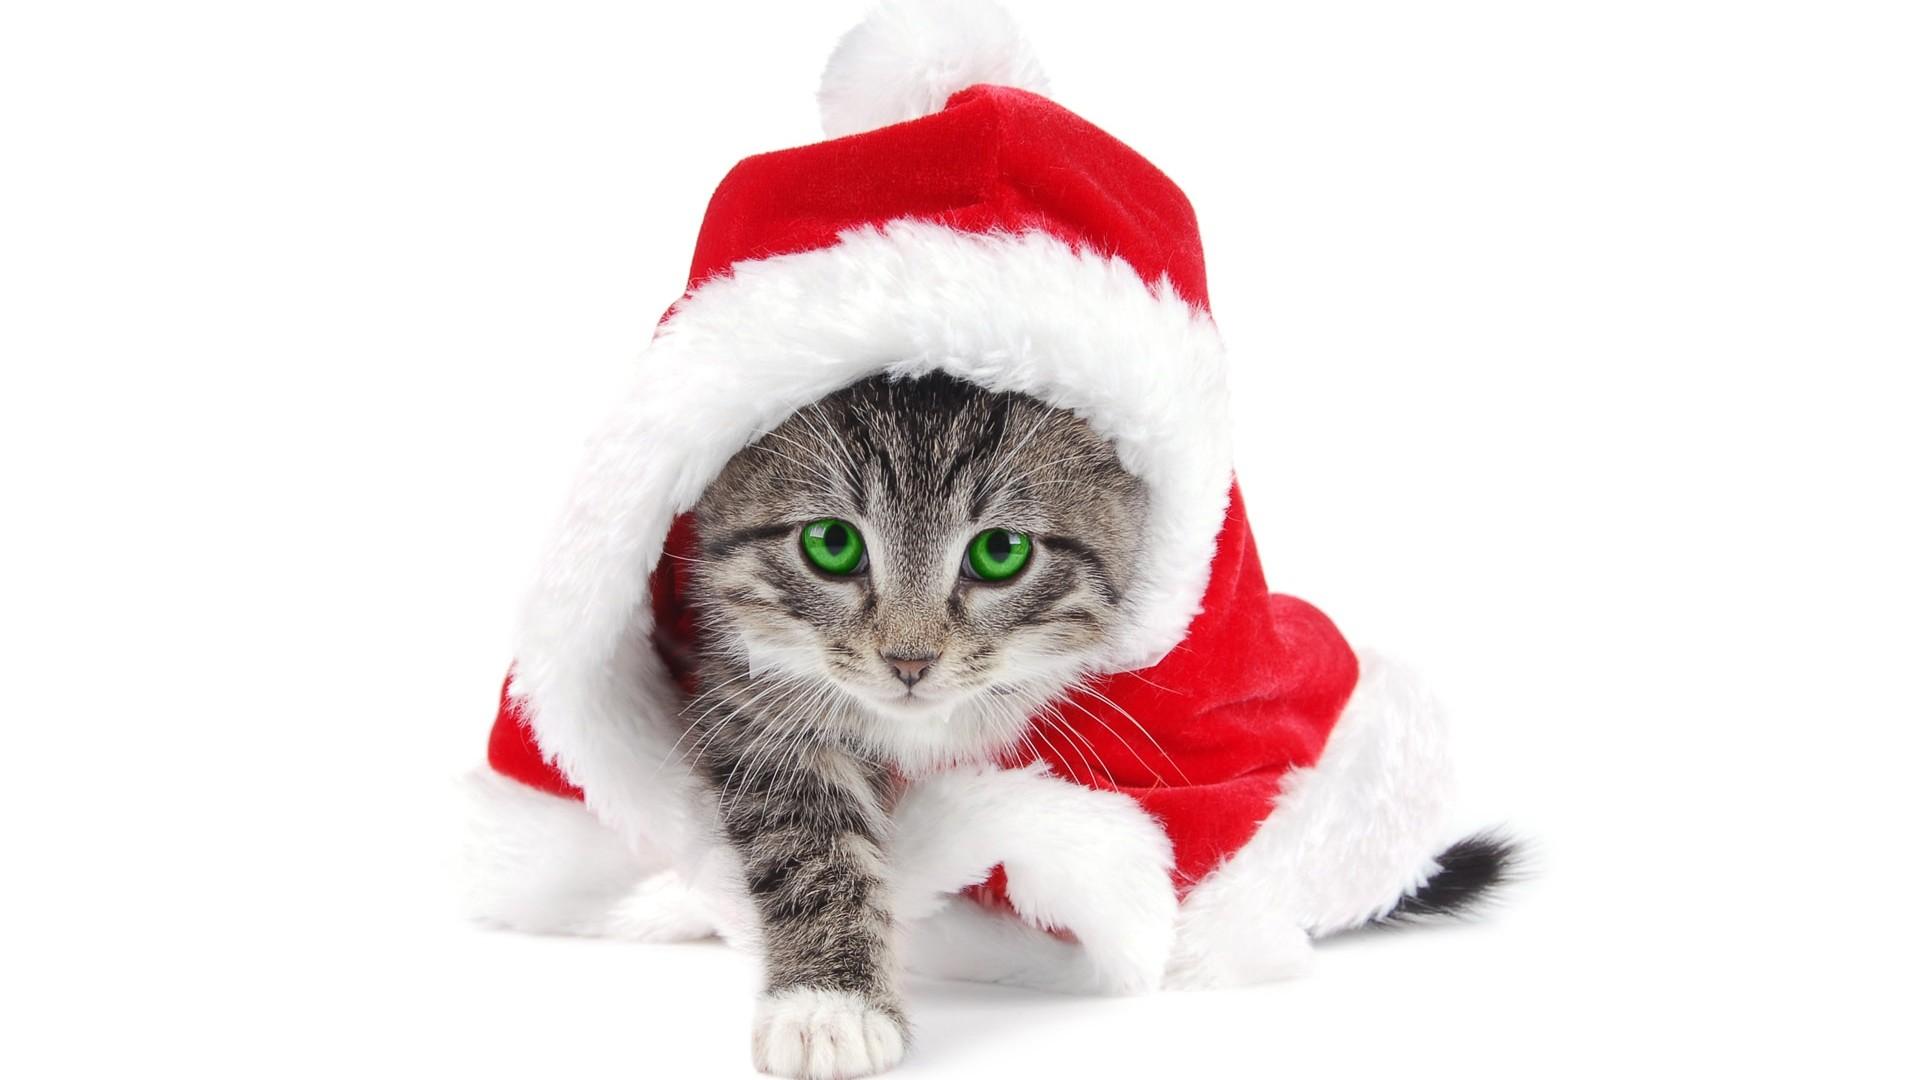 Cute Christmas 760 1920x1080 px 1920x1080